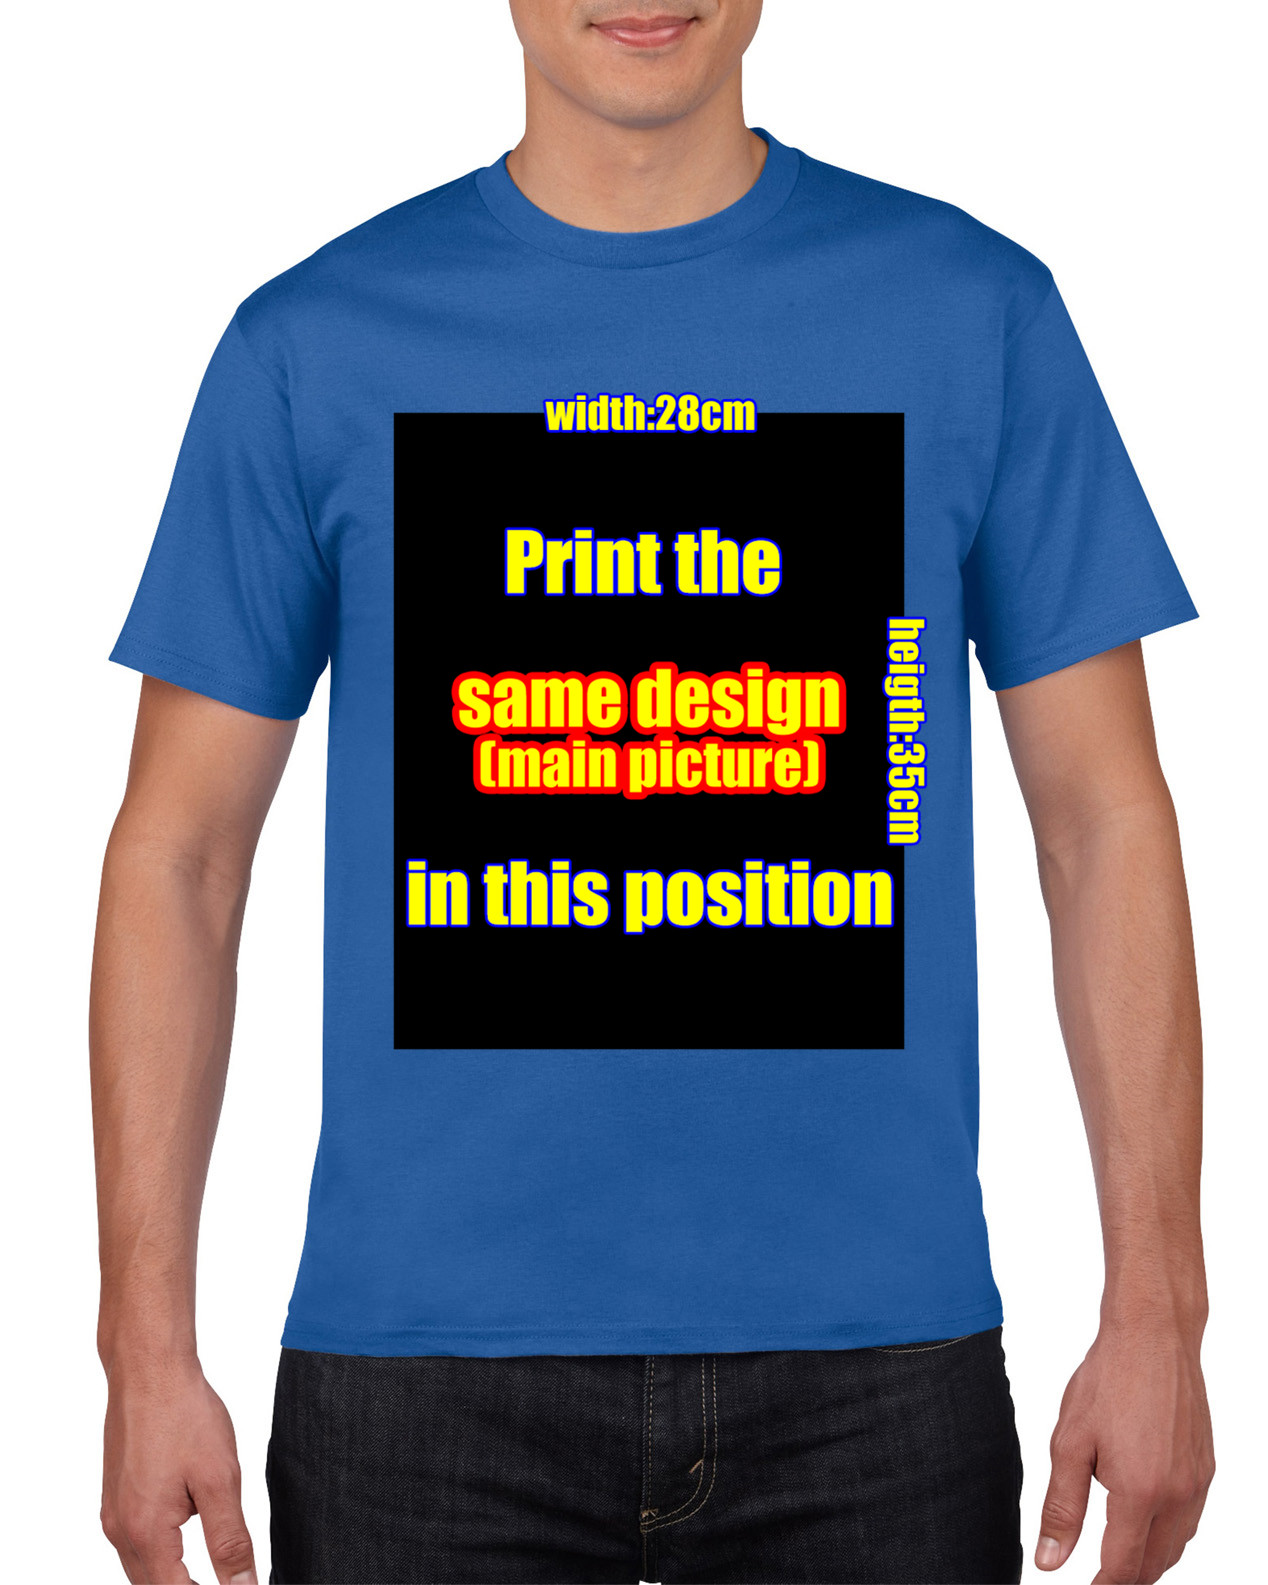 SLAYER T-Shirt Crossed Swords Logo Thrash Heavy Metal Rock Band Concert Tour Tee